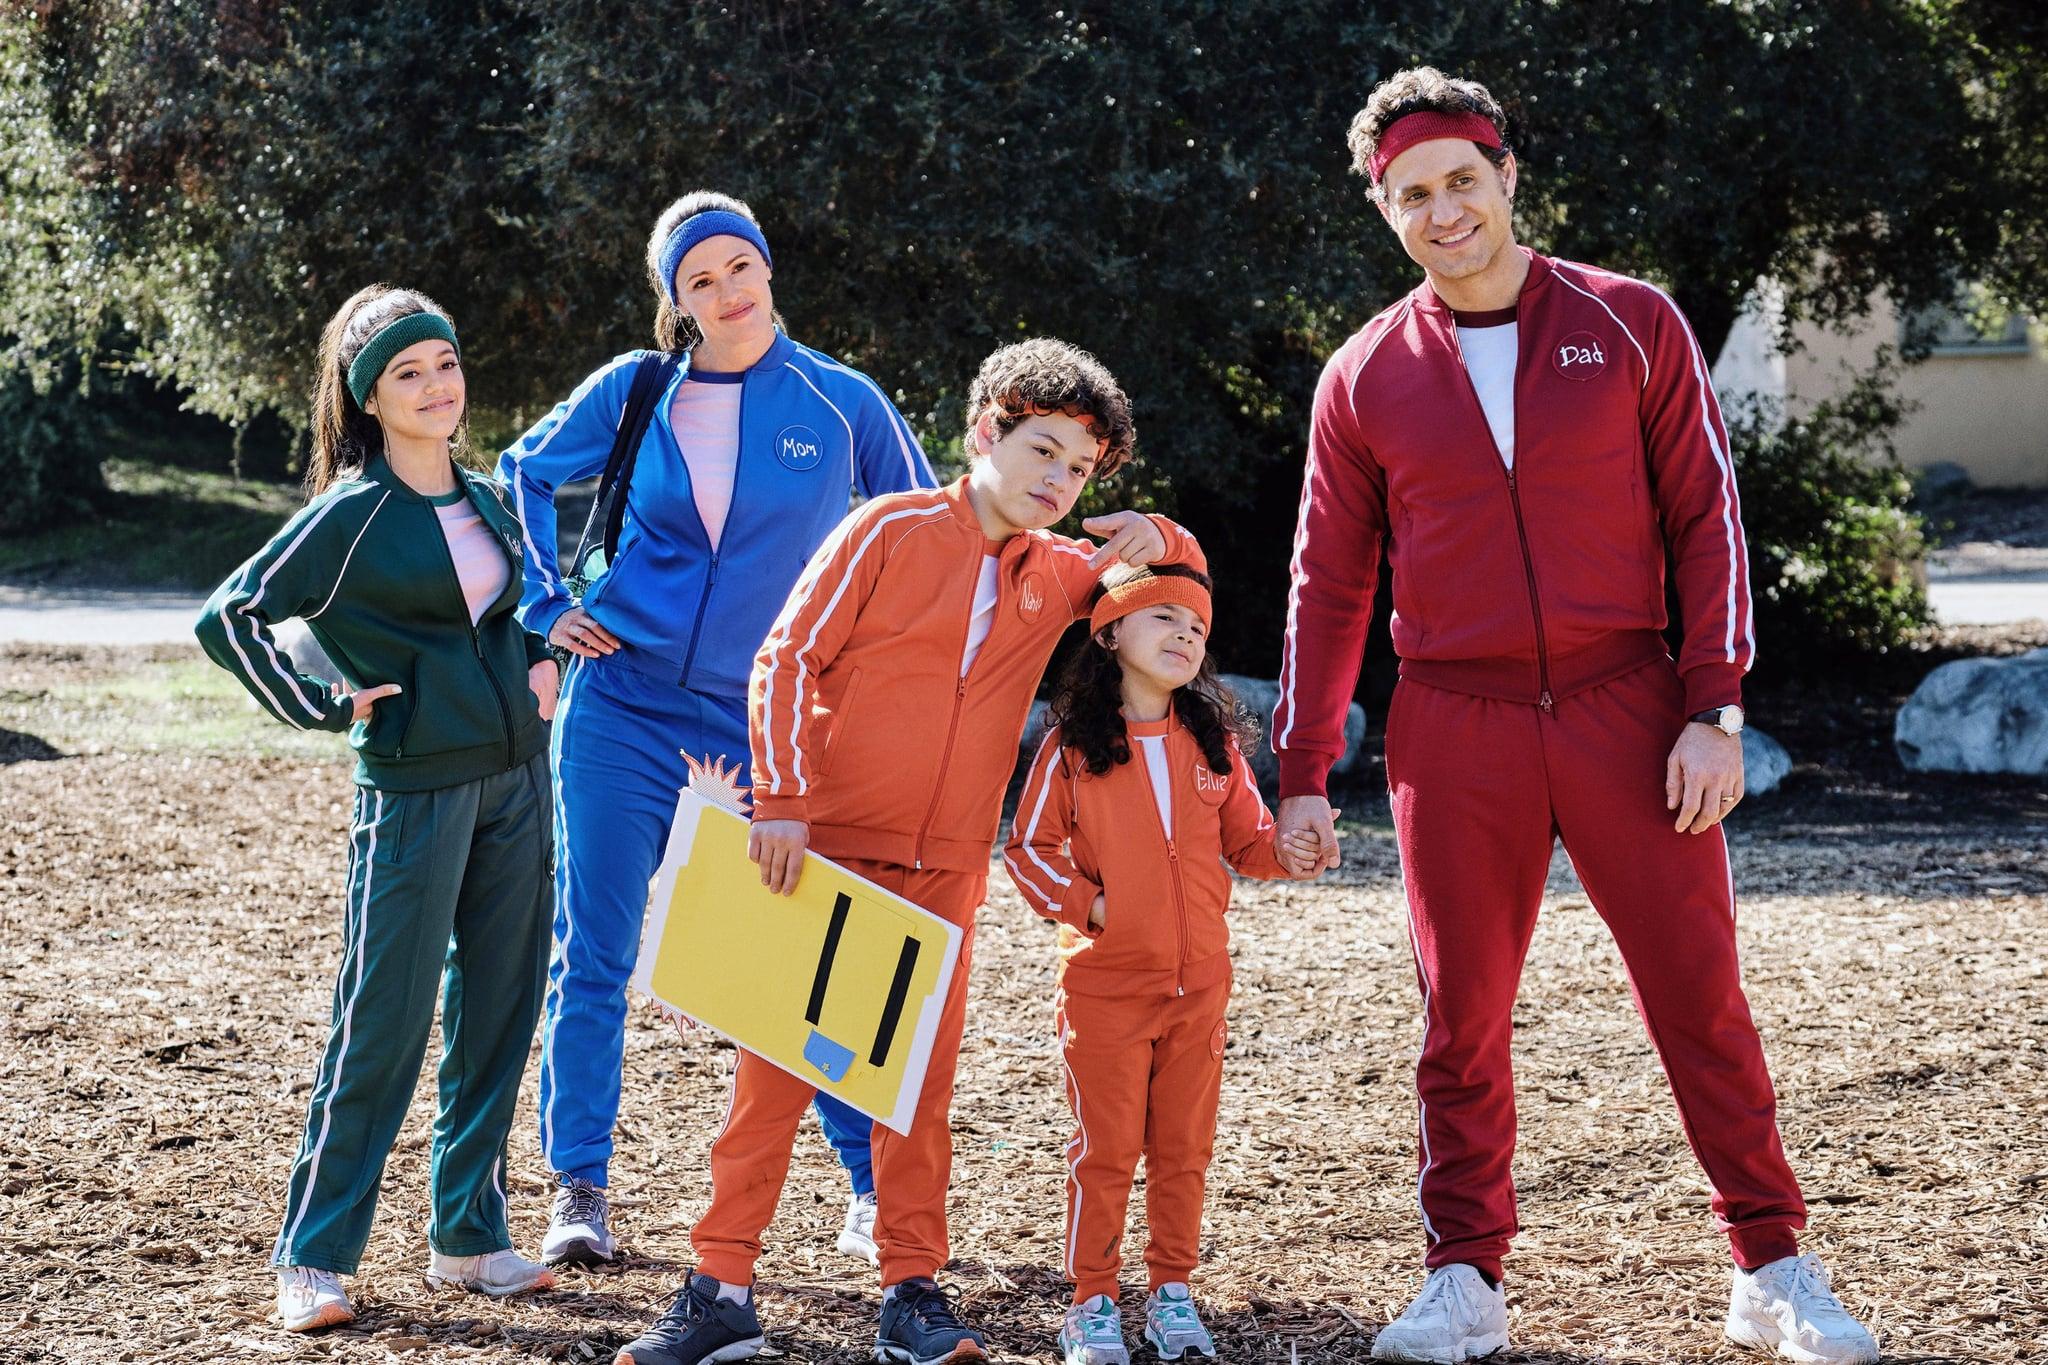 YES DAY, from left: Jenna Ortega, Jennifer Garner, Julian Lerner, Everly Carganilla, Edgar Ramirez, 2021. ph: Matt Kennedy /  Netflix / Courtesy Everett Collection